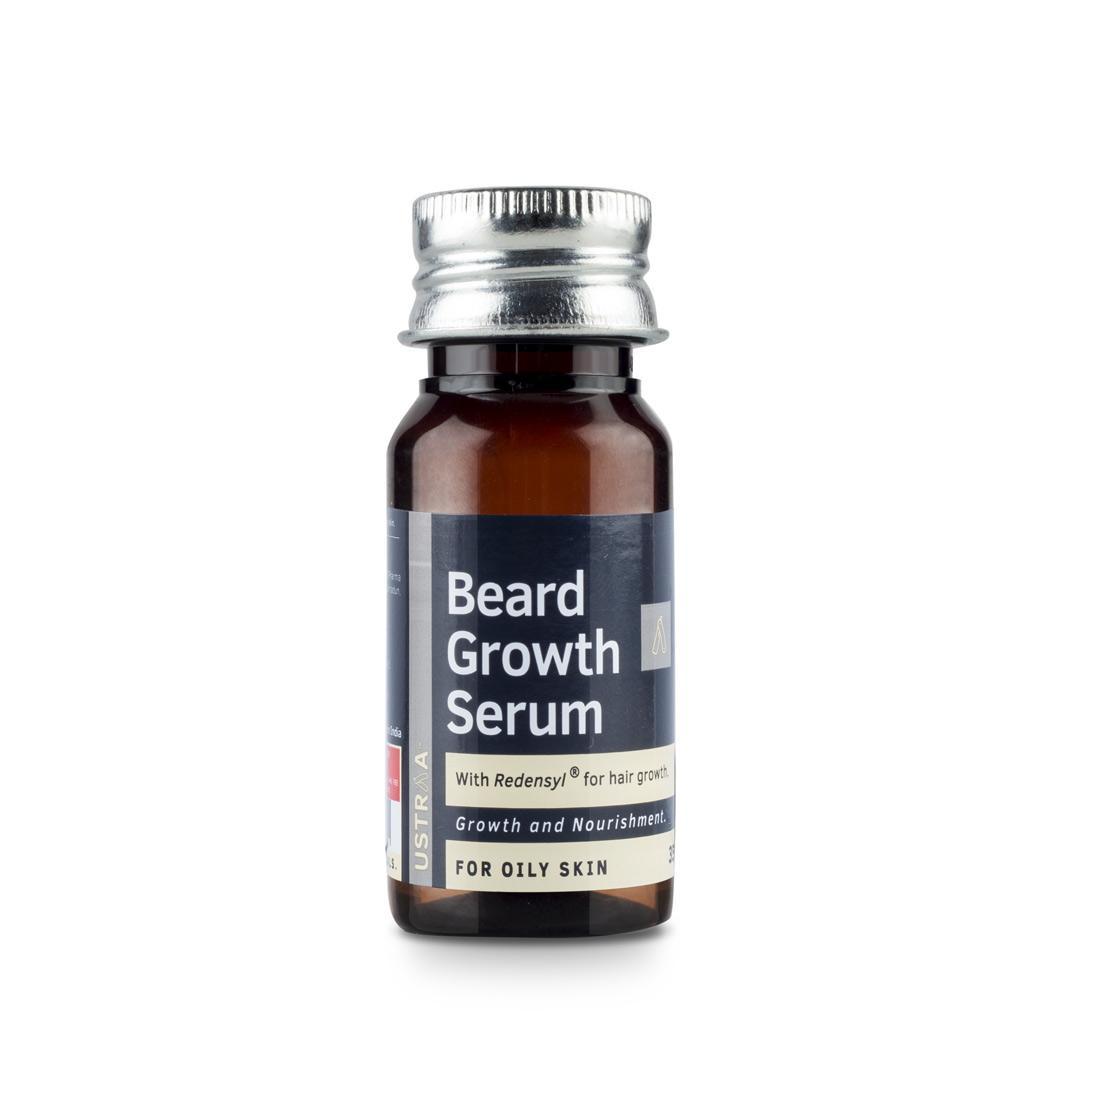 USTRAA Beard Growth Serum (Oily Skin) 35 ml - With Redensyl for Acne-prone & Sensitive Skin, Boosts Beard Growth, Beard Nourishment and Moisturization